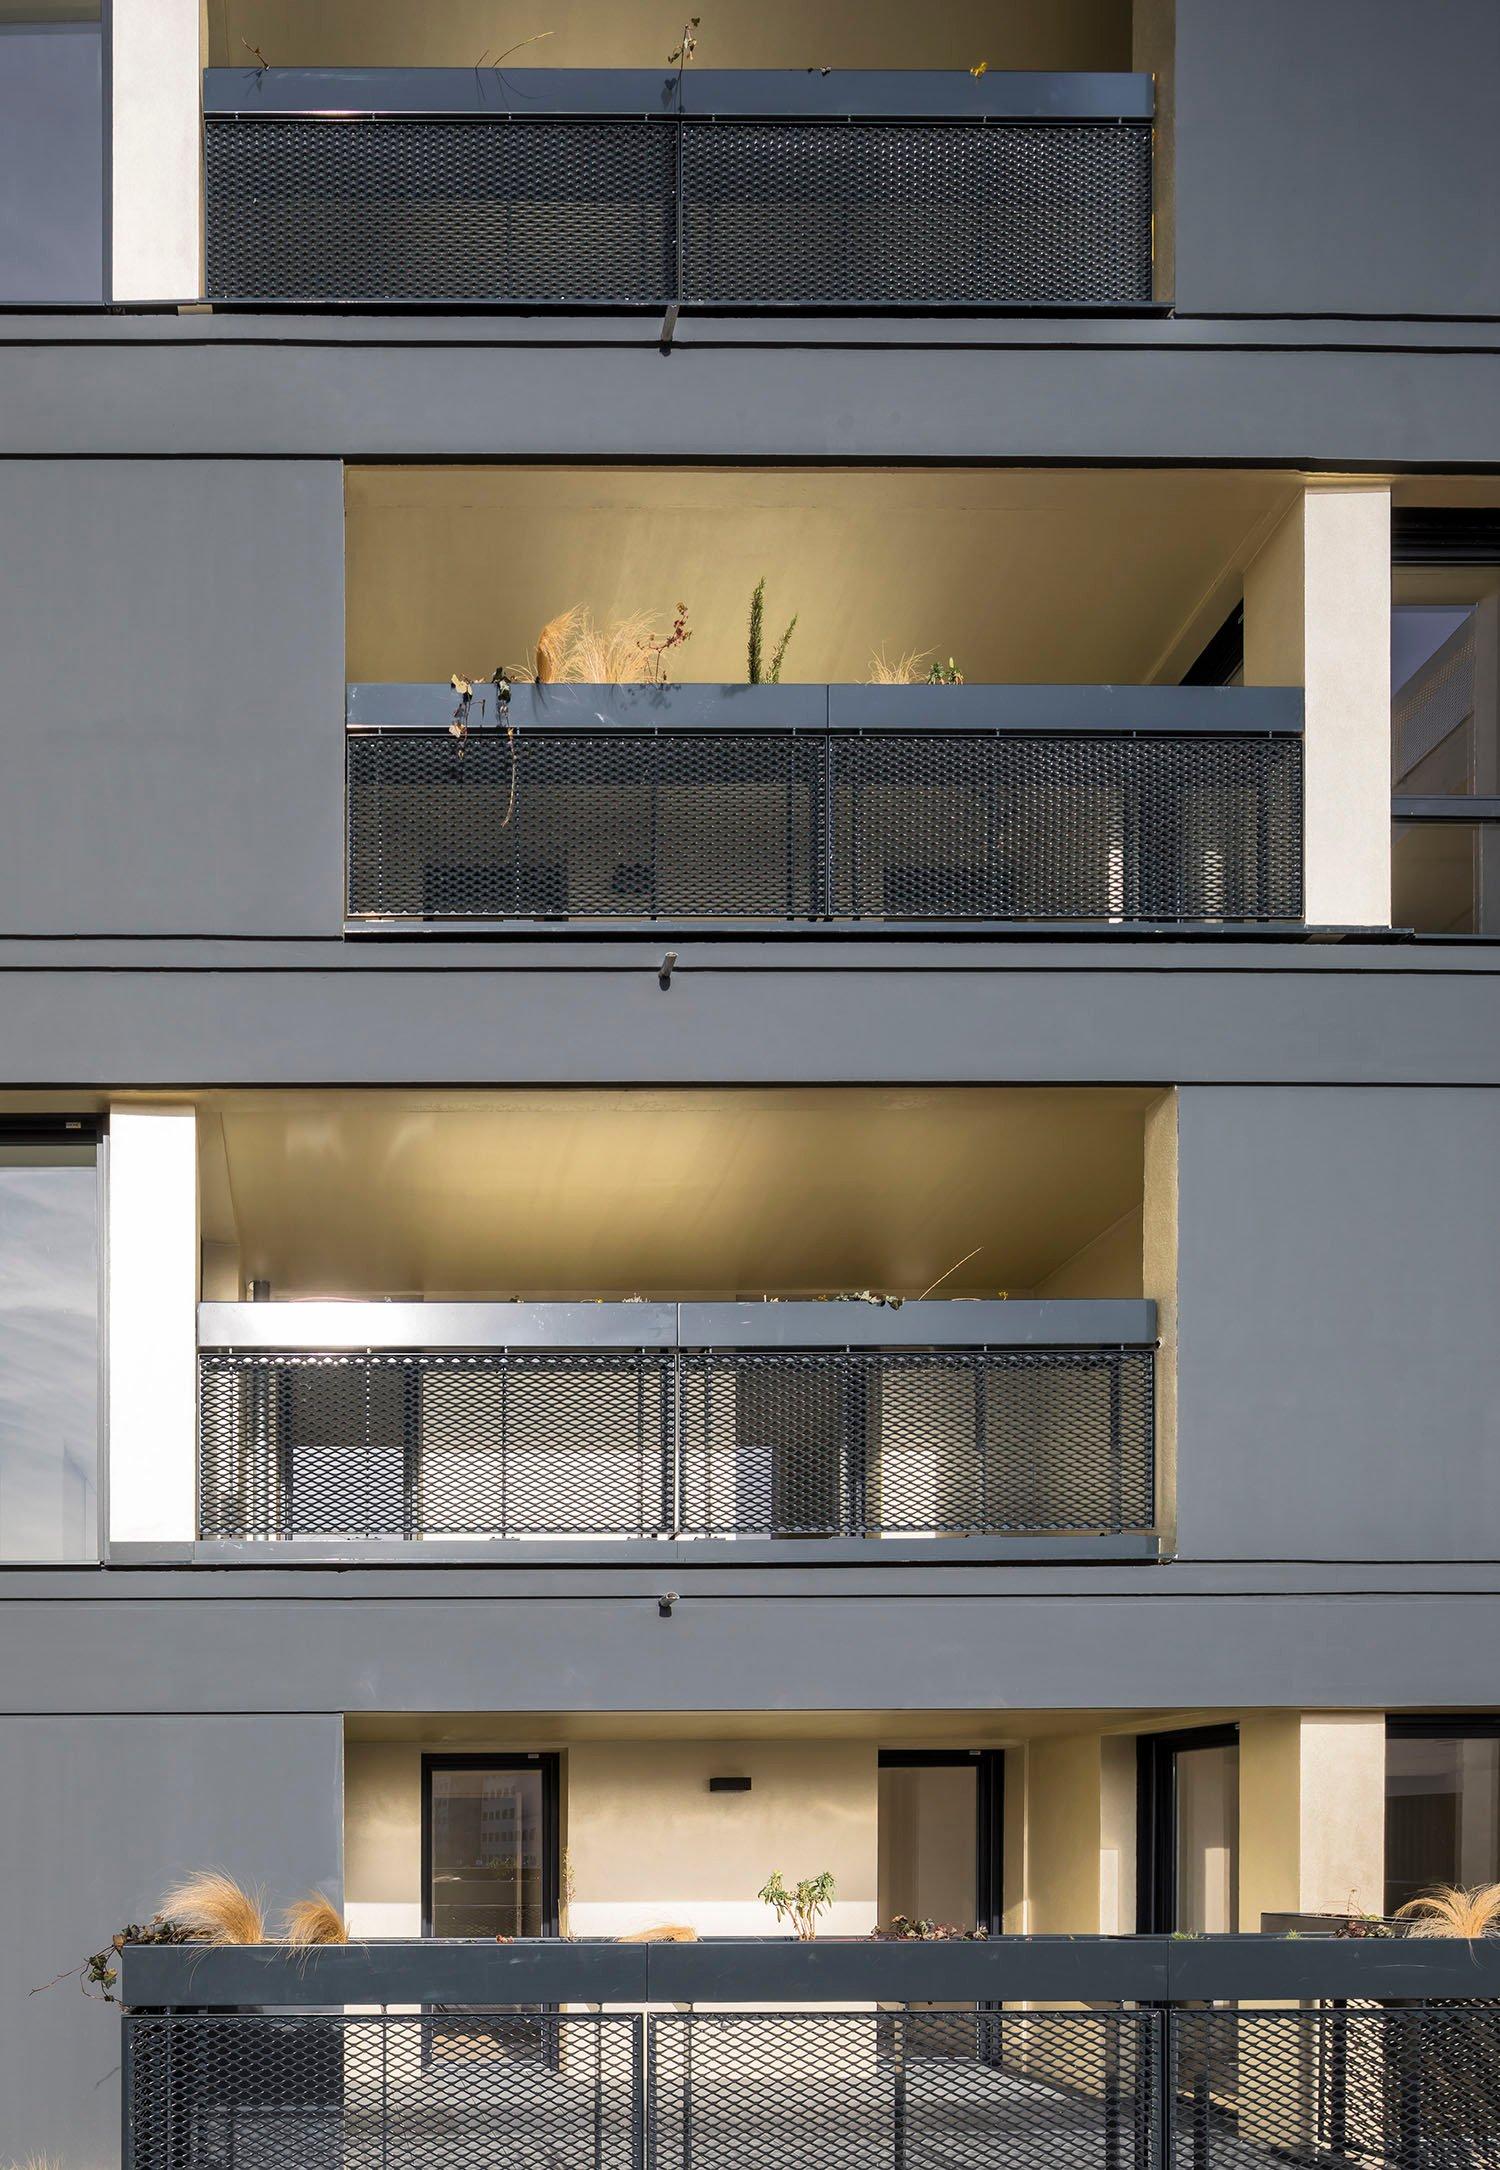 PETITDIDIERPRIOUX Architectes - 152 housing units in Villeurbanne - South facade zoom Sergio Grazia